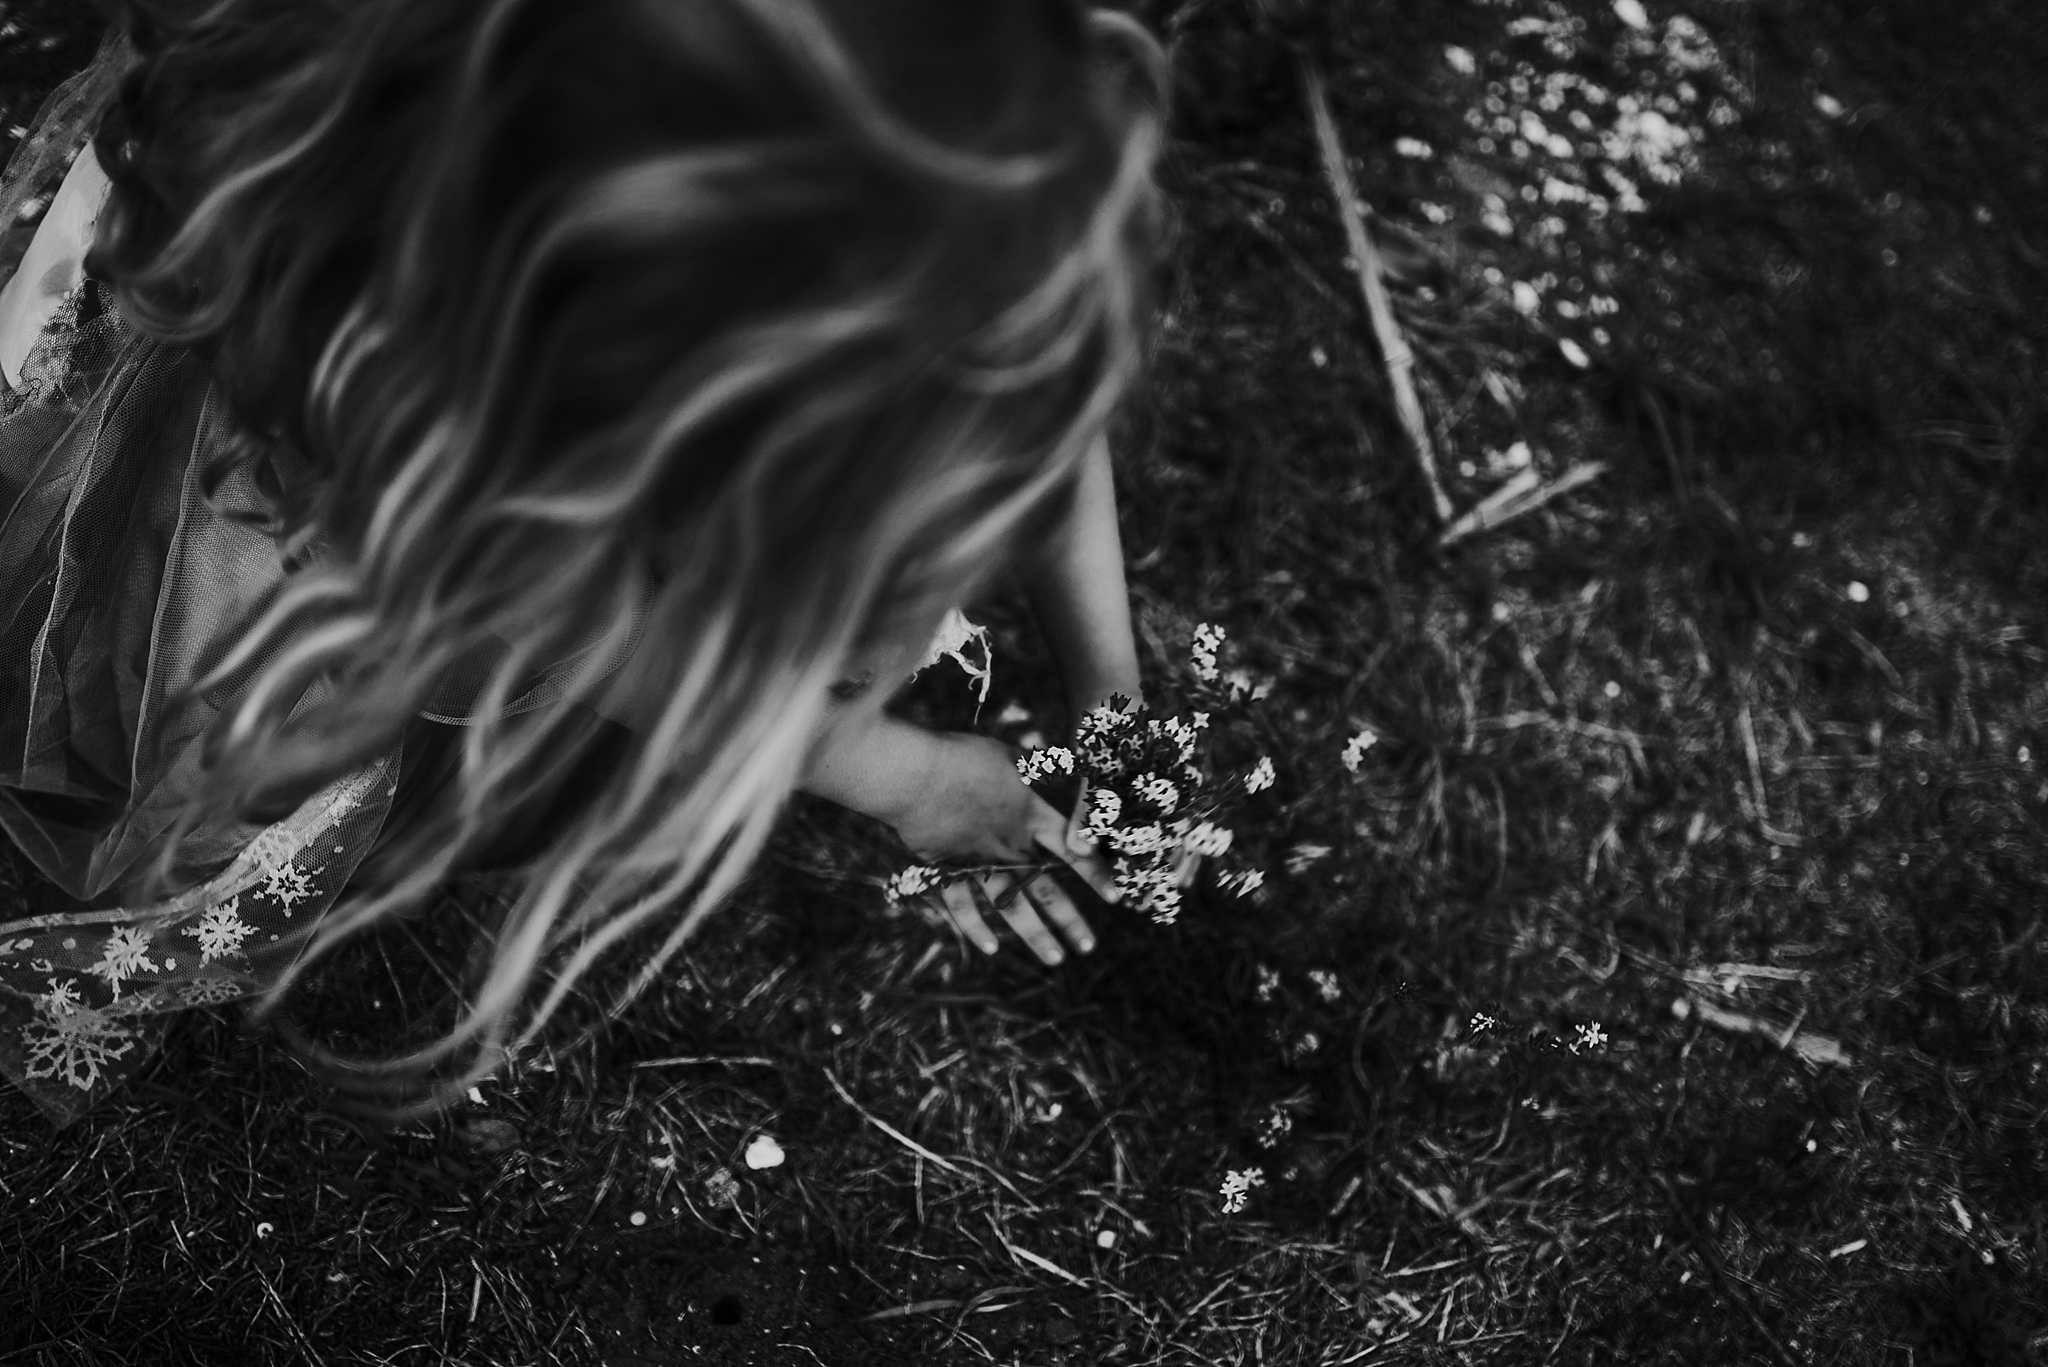 twyla jones photography - treasure coast - florida family photography riverbend park jupiter florida-6270.jpg